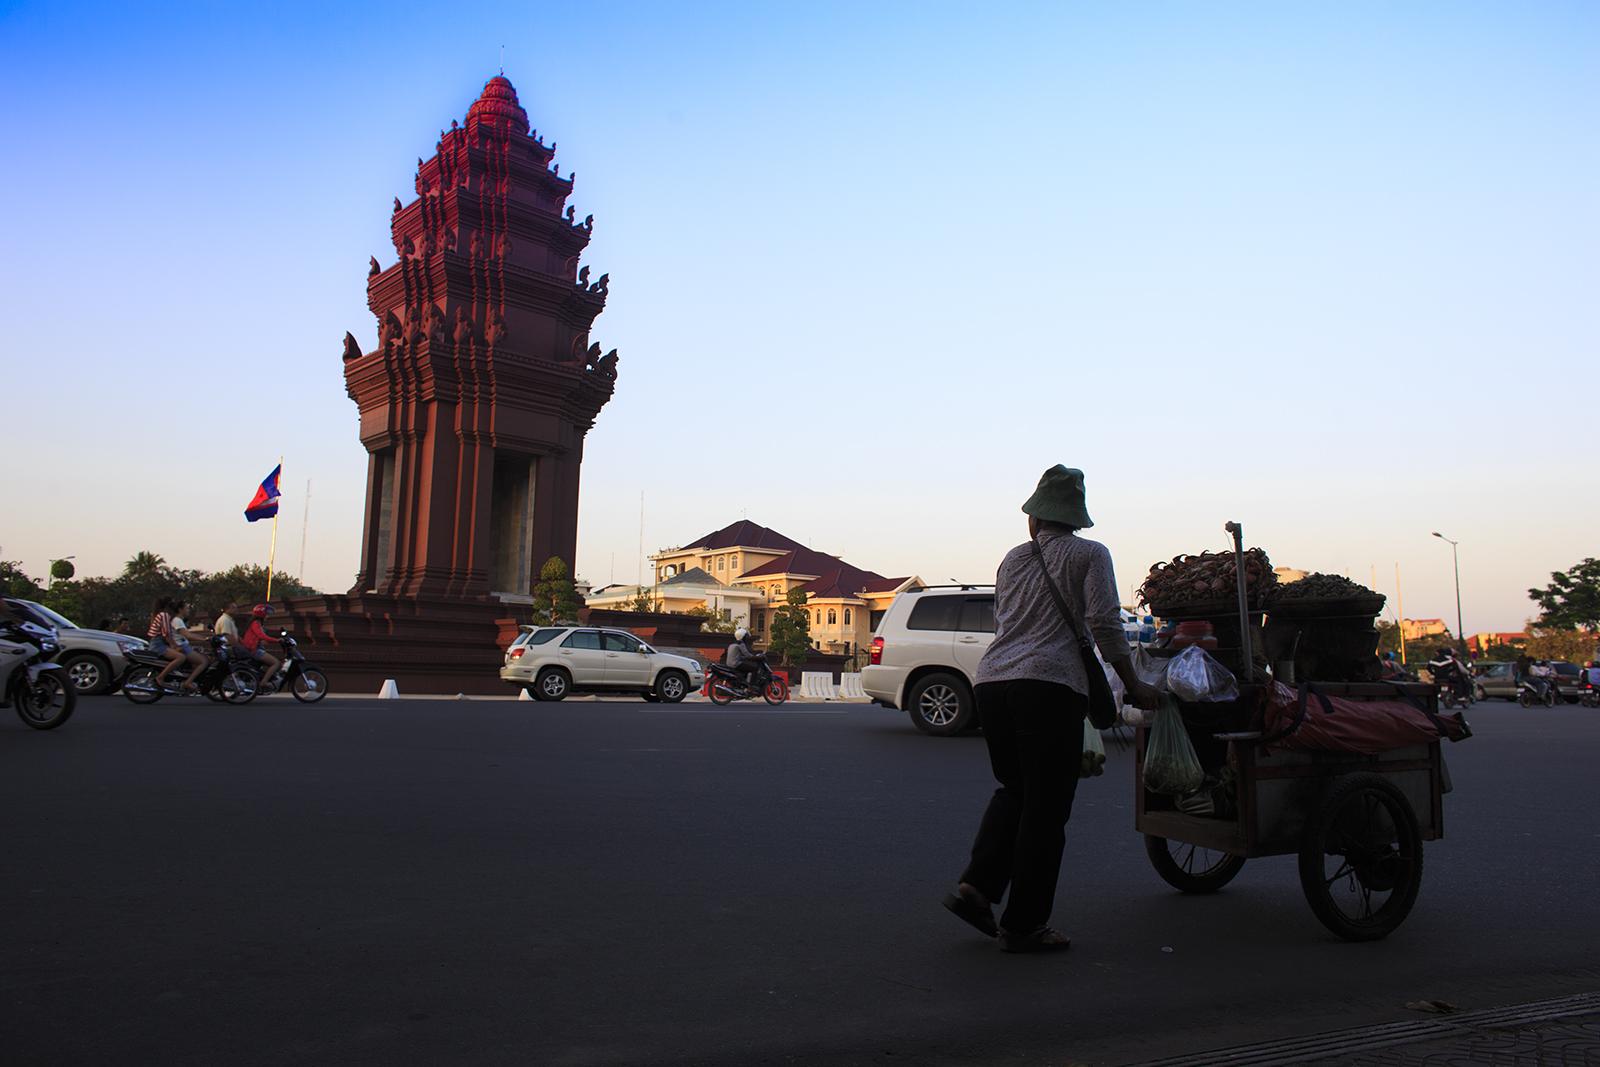 cambodia 2013 street seller